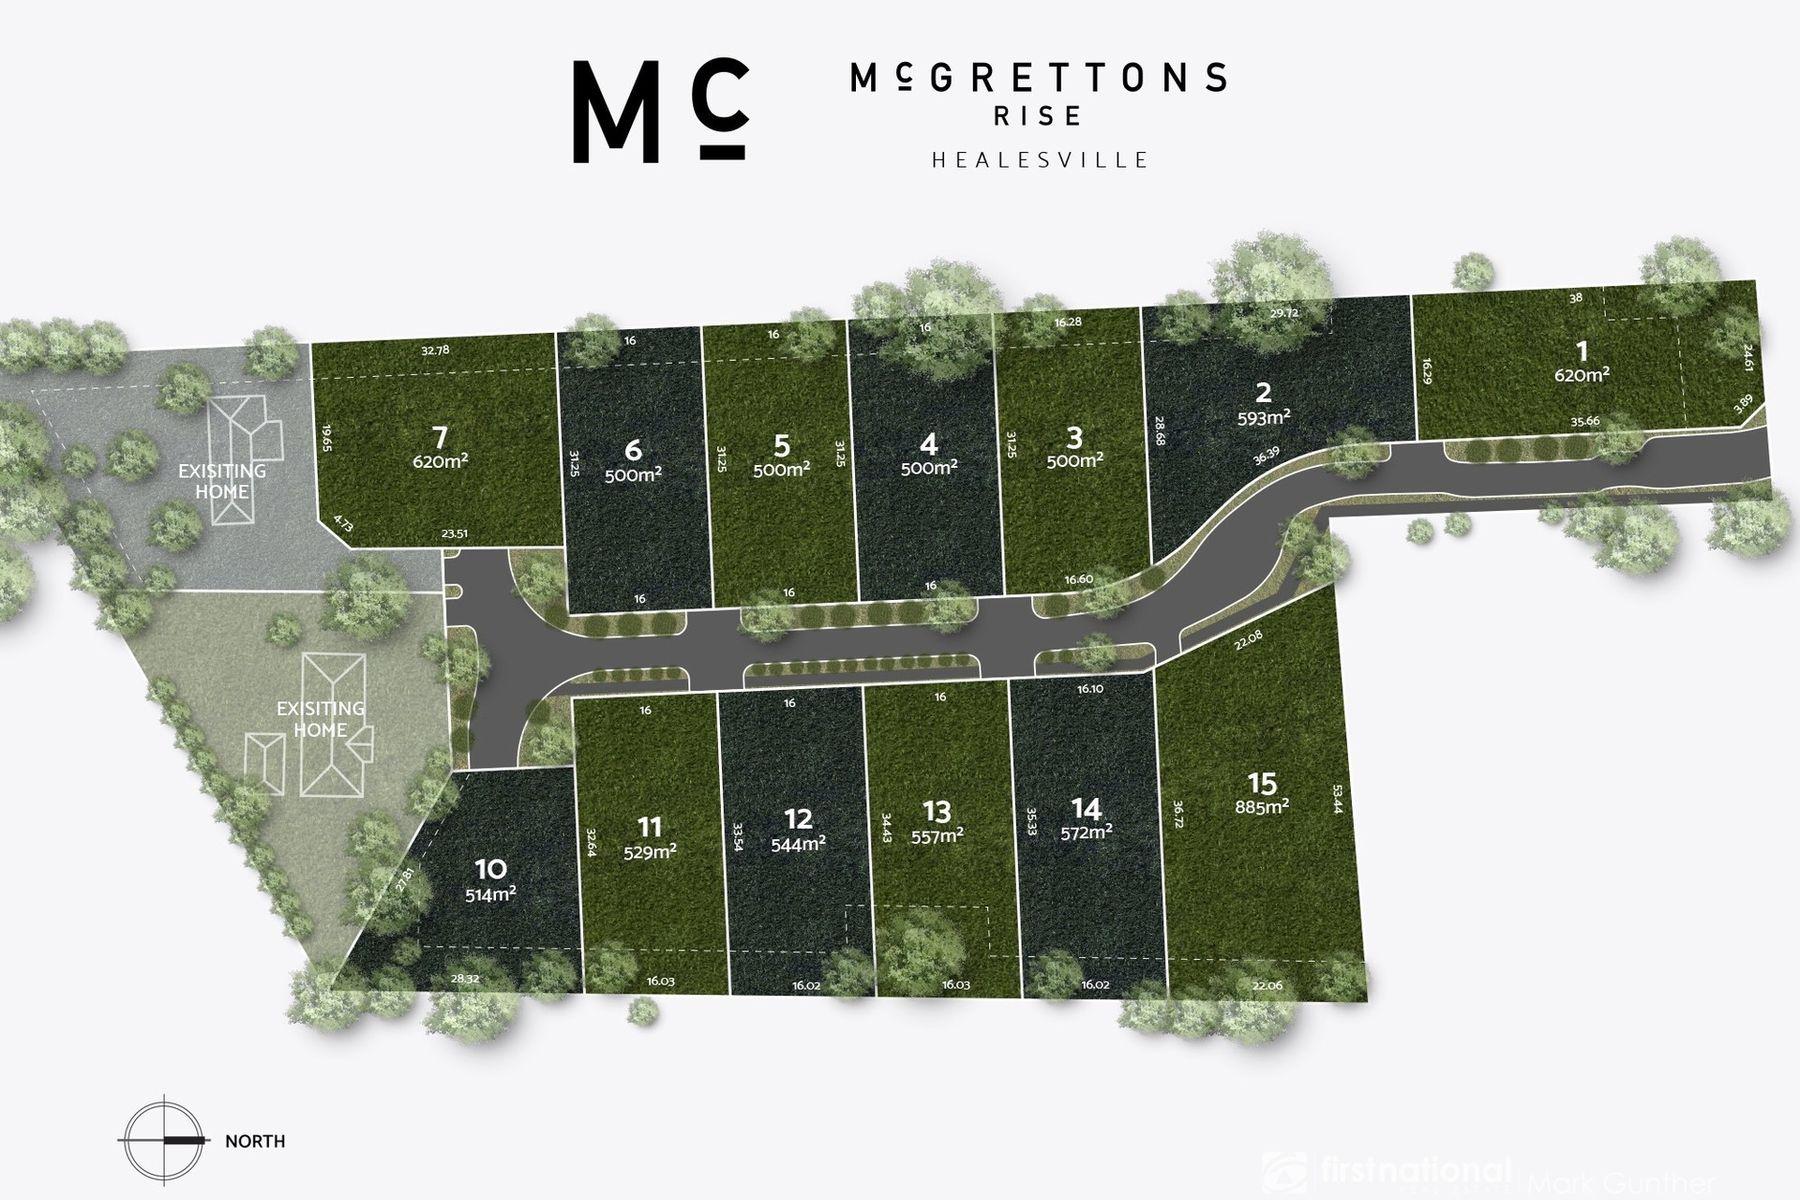 Lot 14/29 Mcgrettons Road, Healesville, VIC 3777